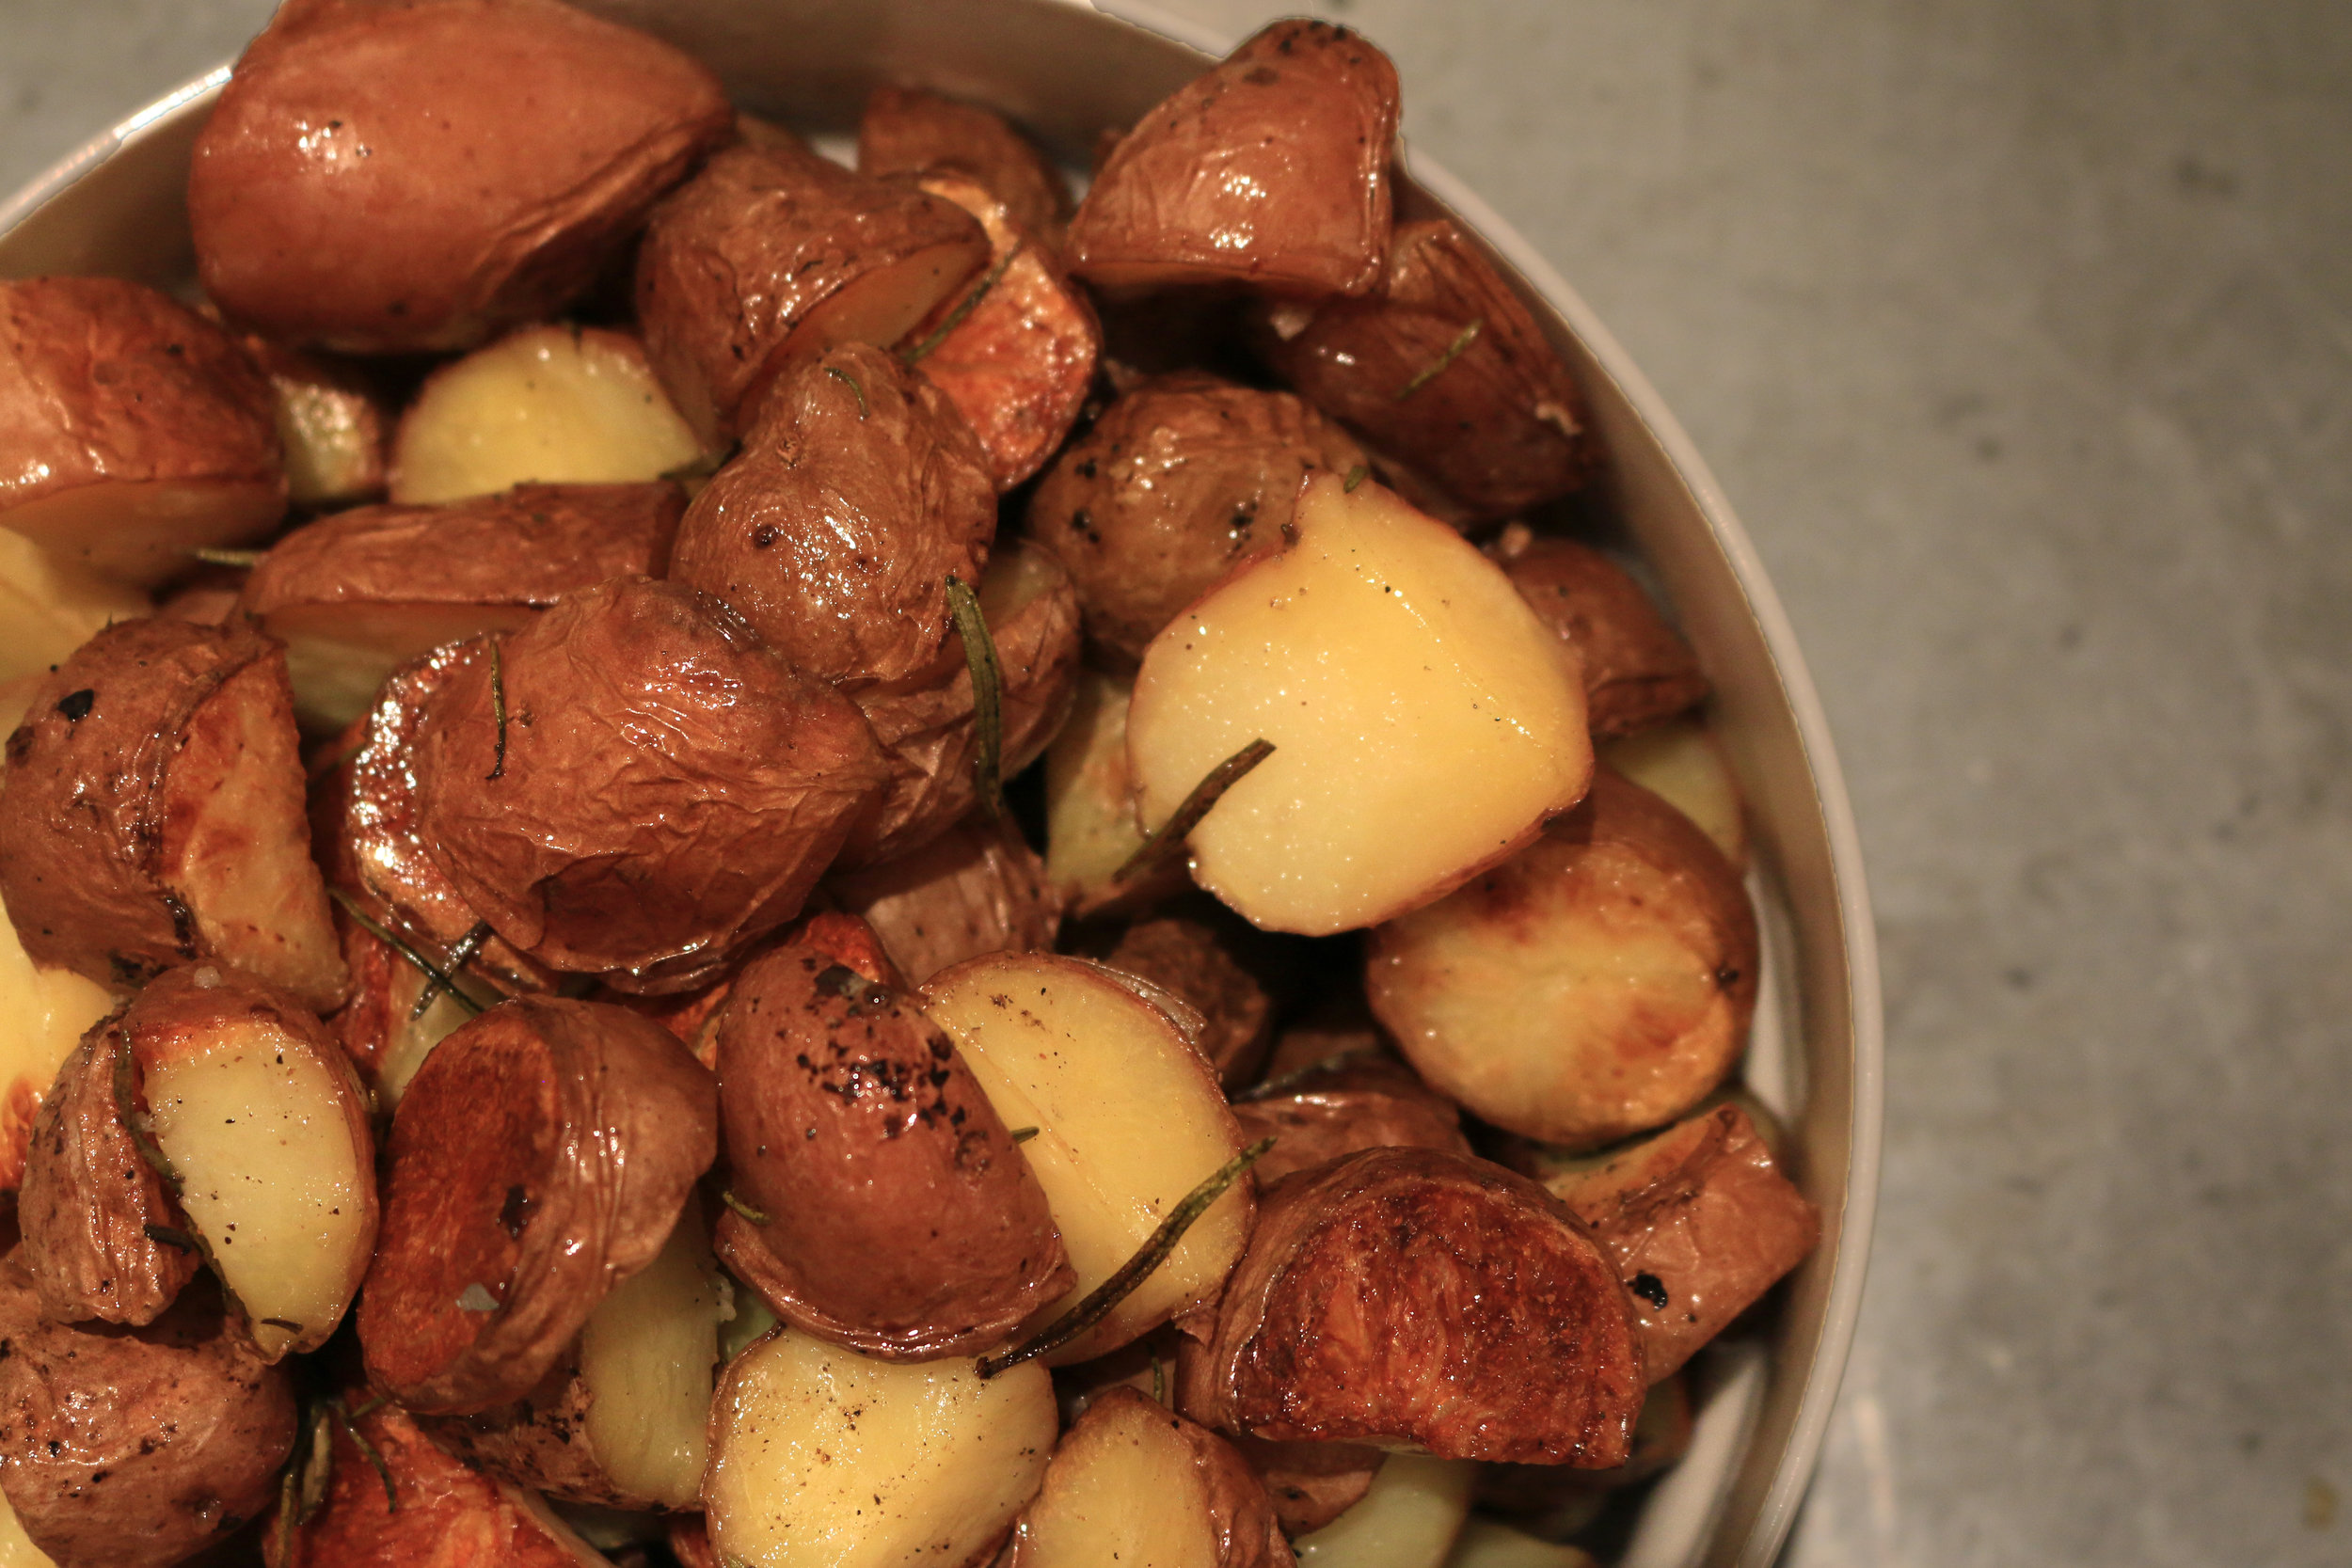 Oven-baked-potatoes-recipe-gourmandesante